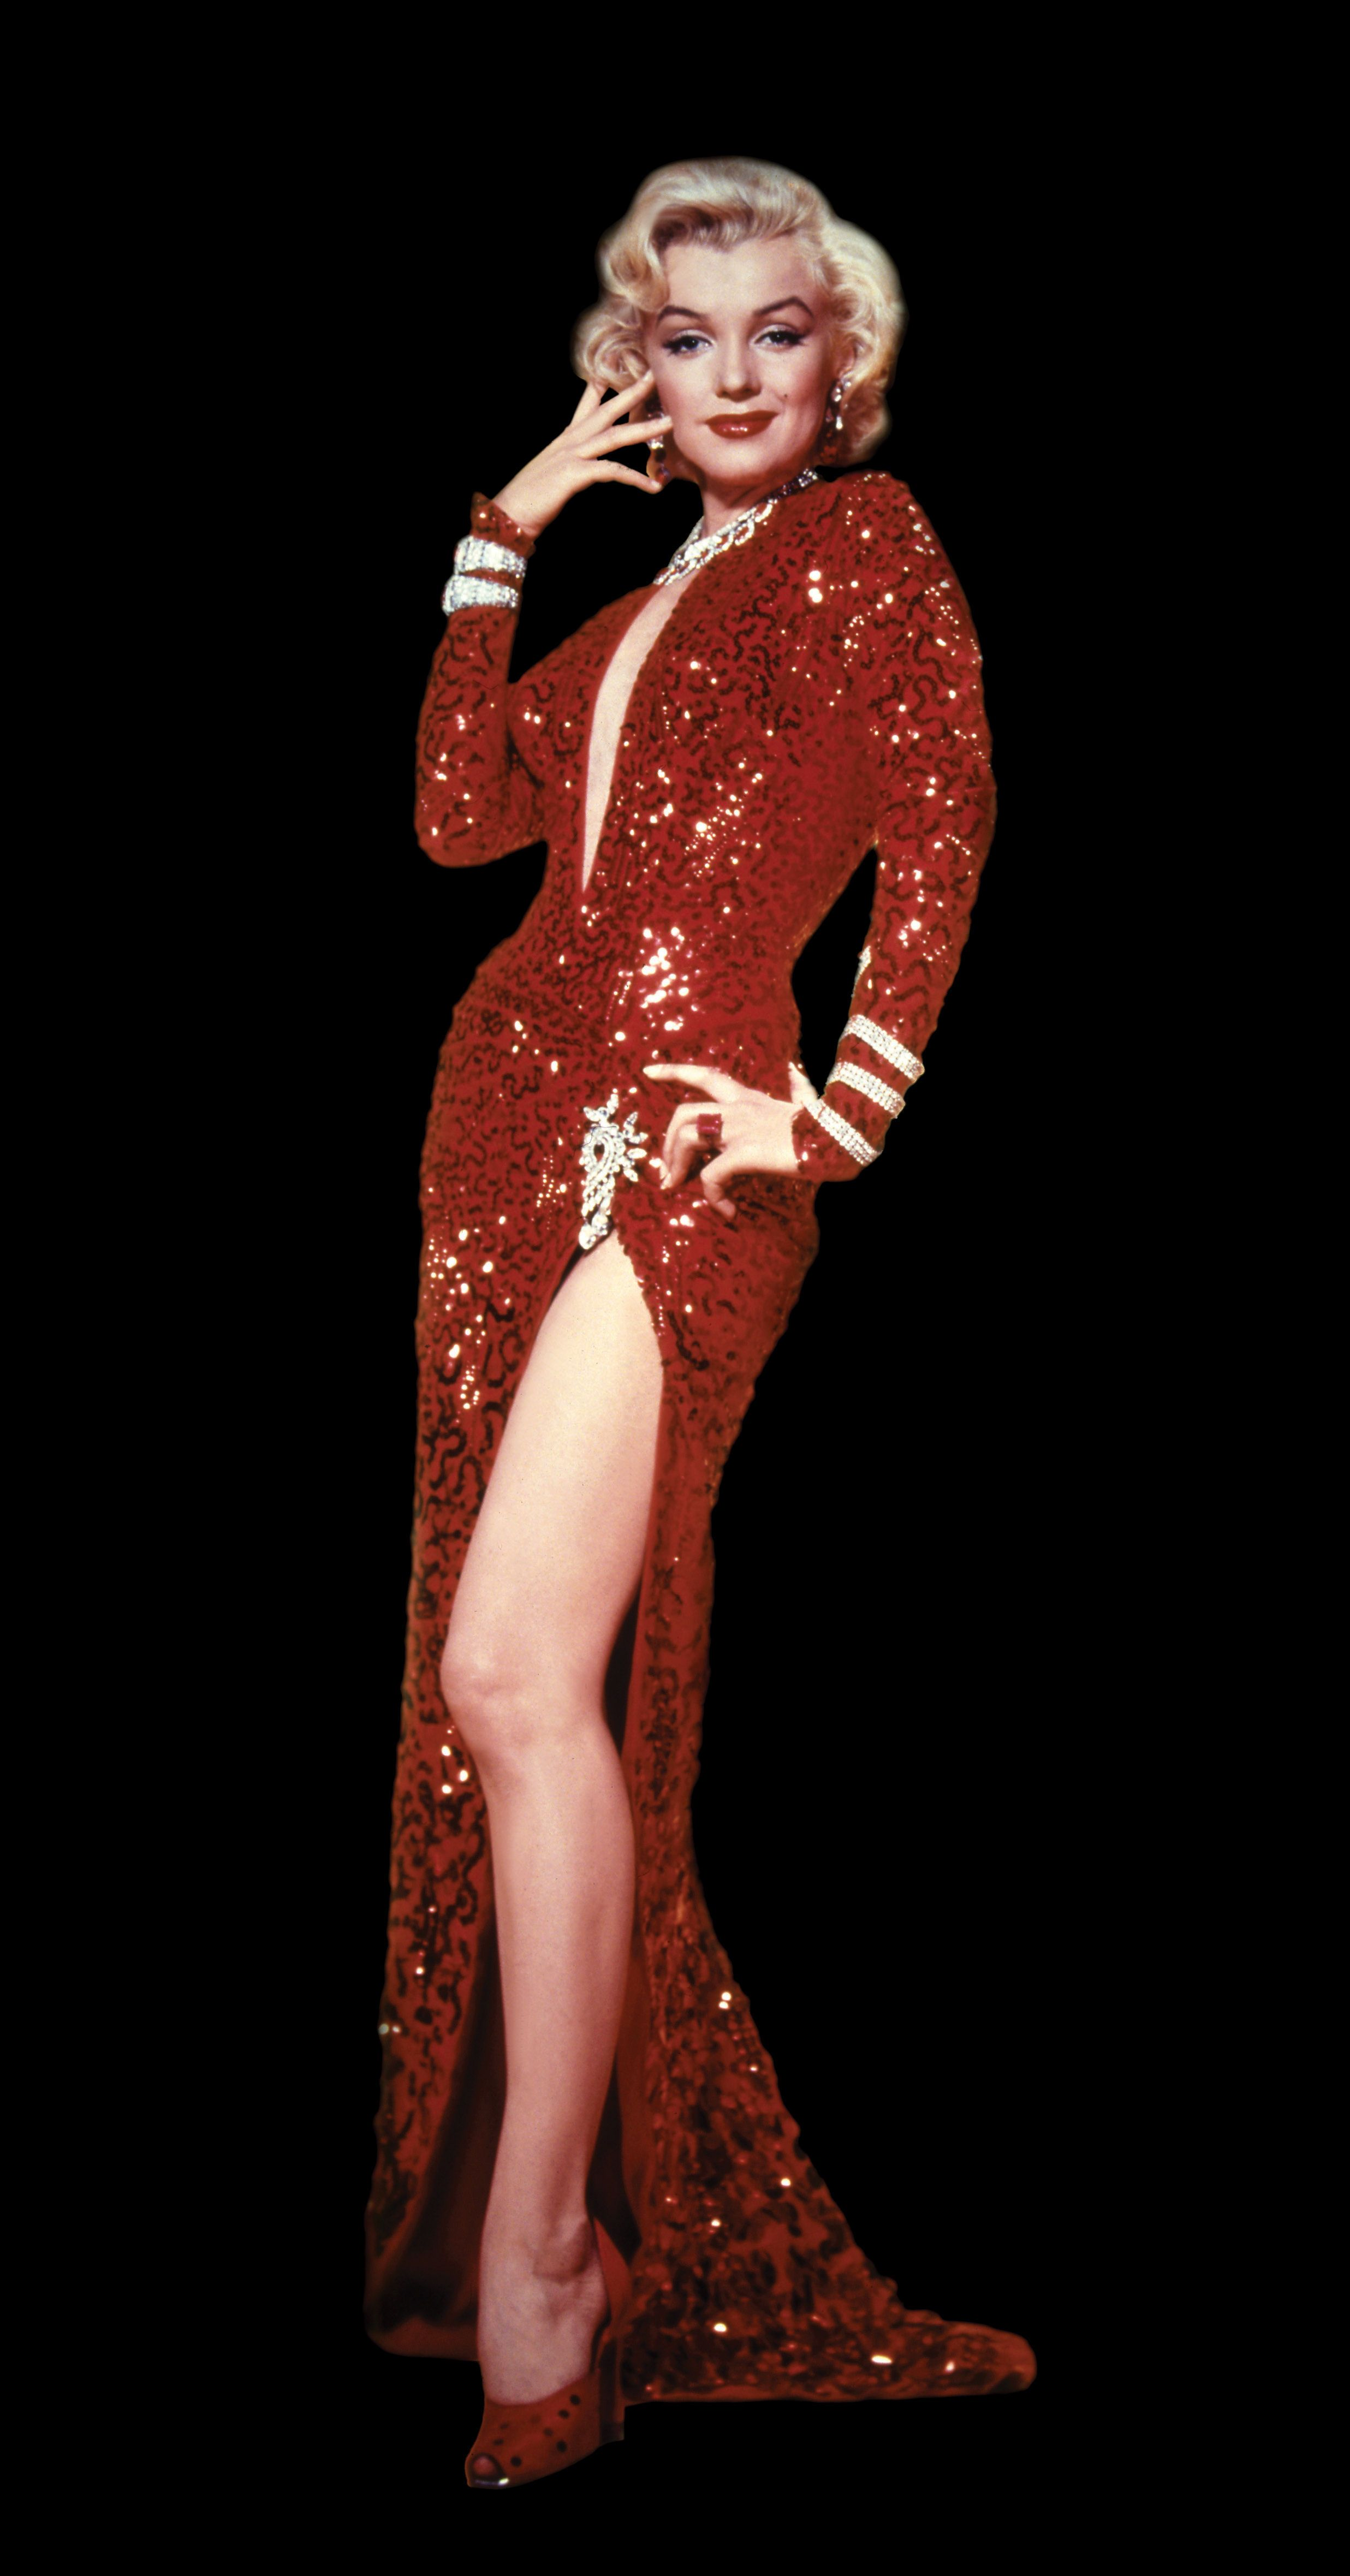 Marilyn Monroe Red Dress - Cocktail Dresses 2016